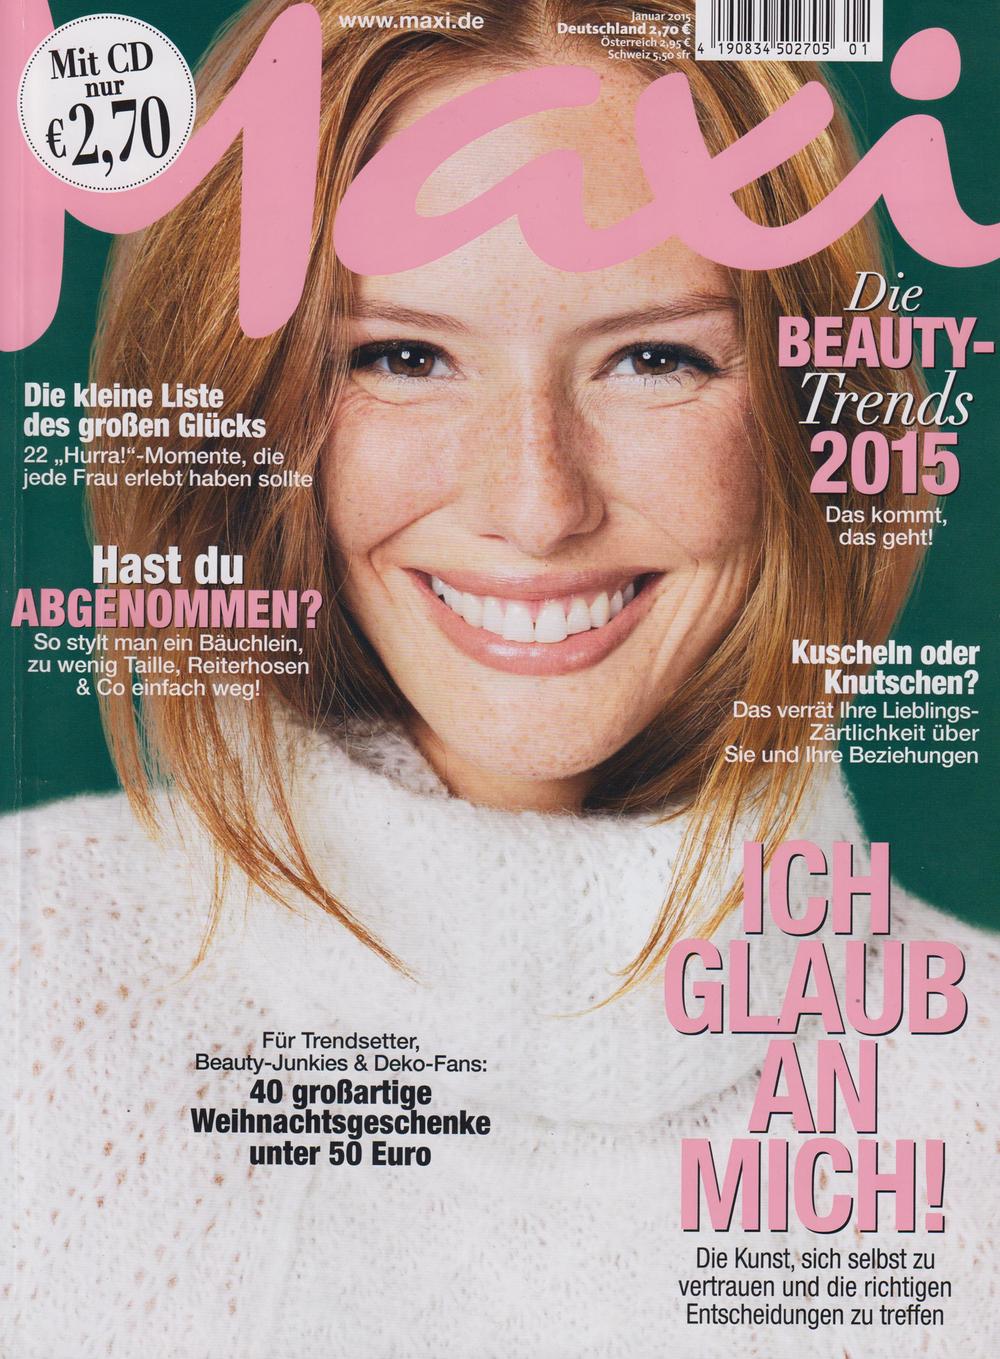 Maxi_Januar 2015_Bea Bühler_Cover.jpg.jpg